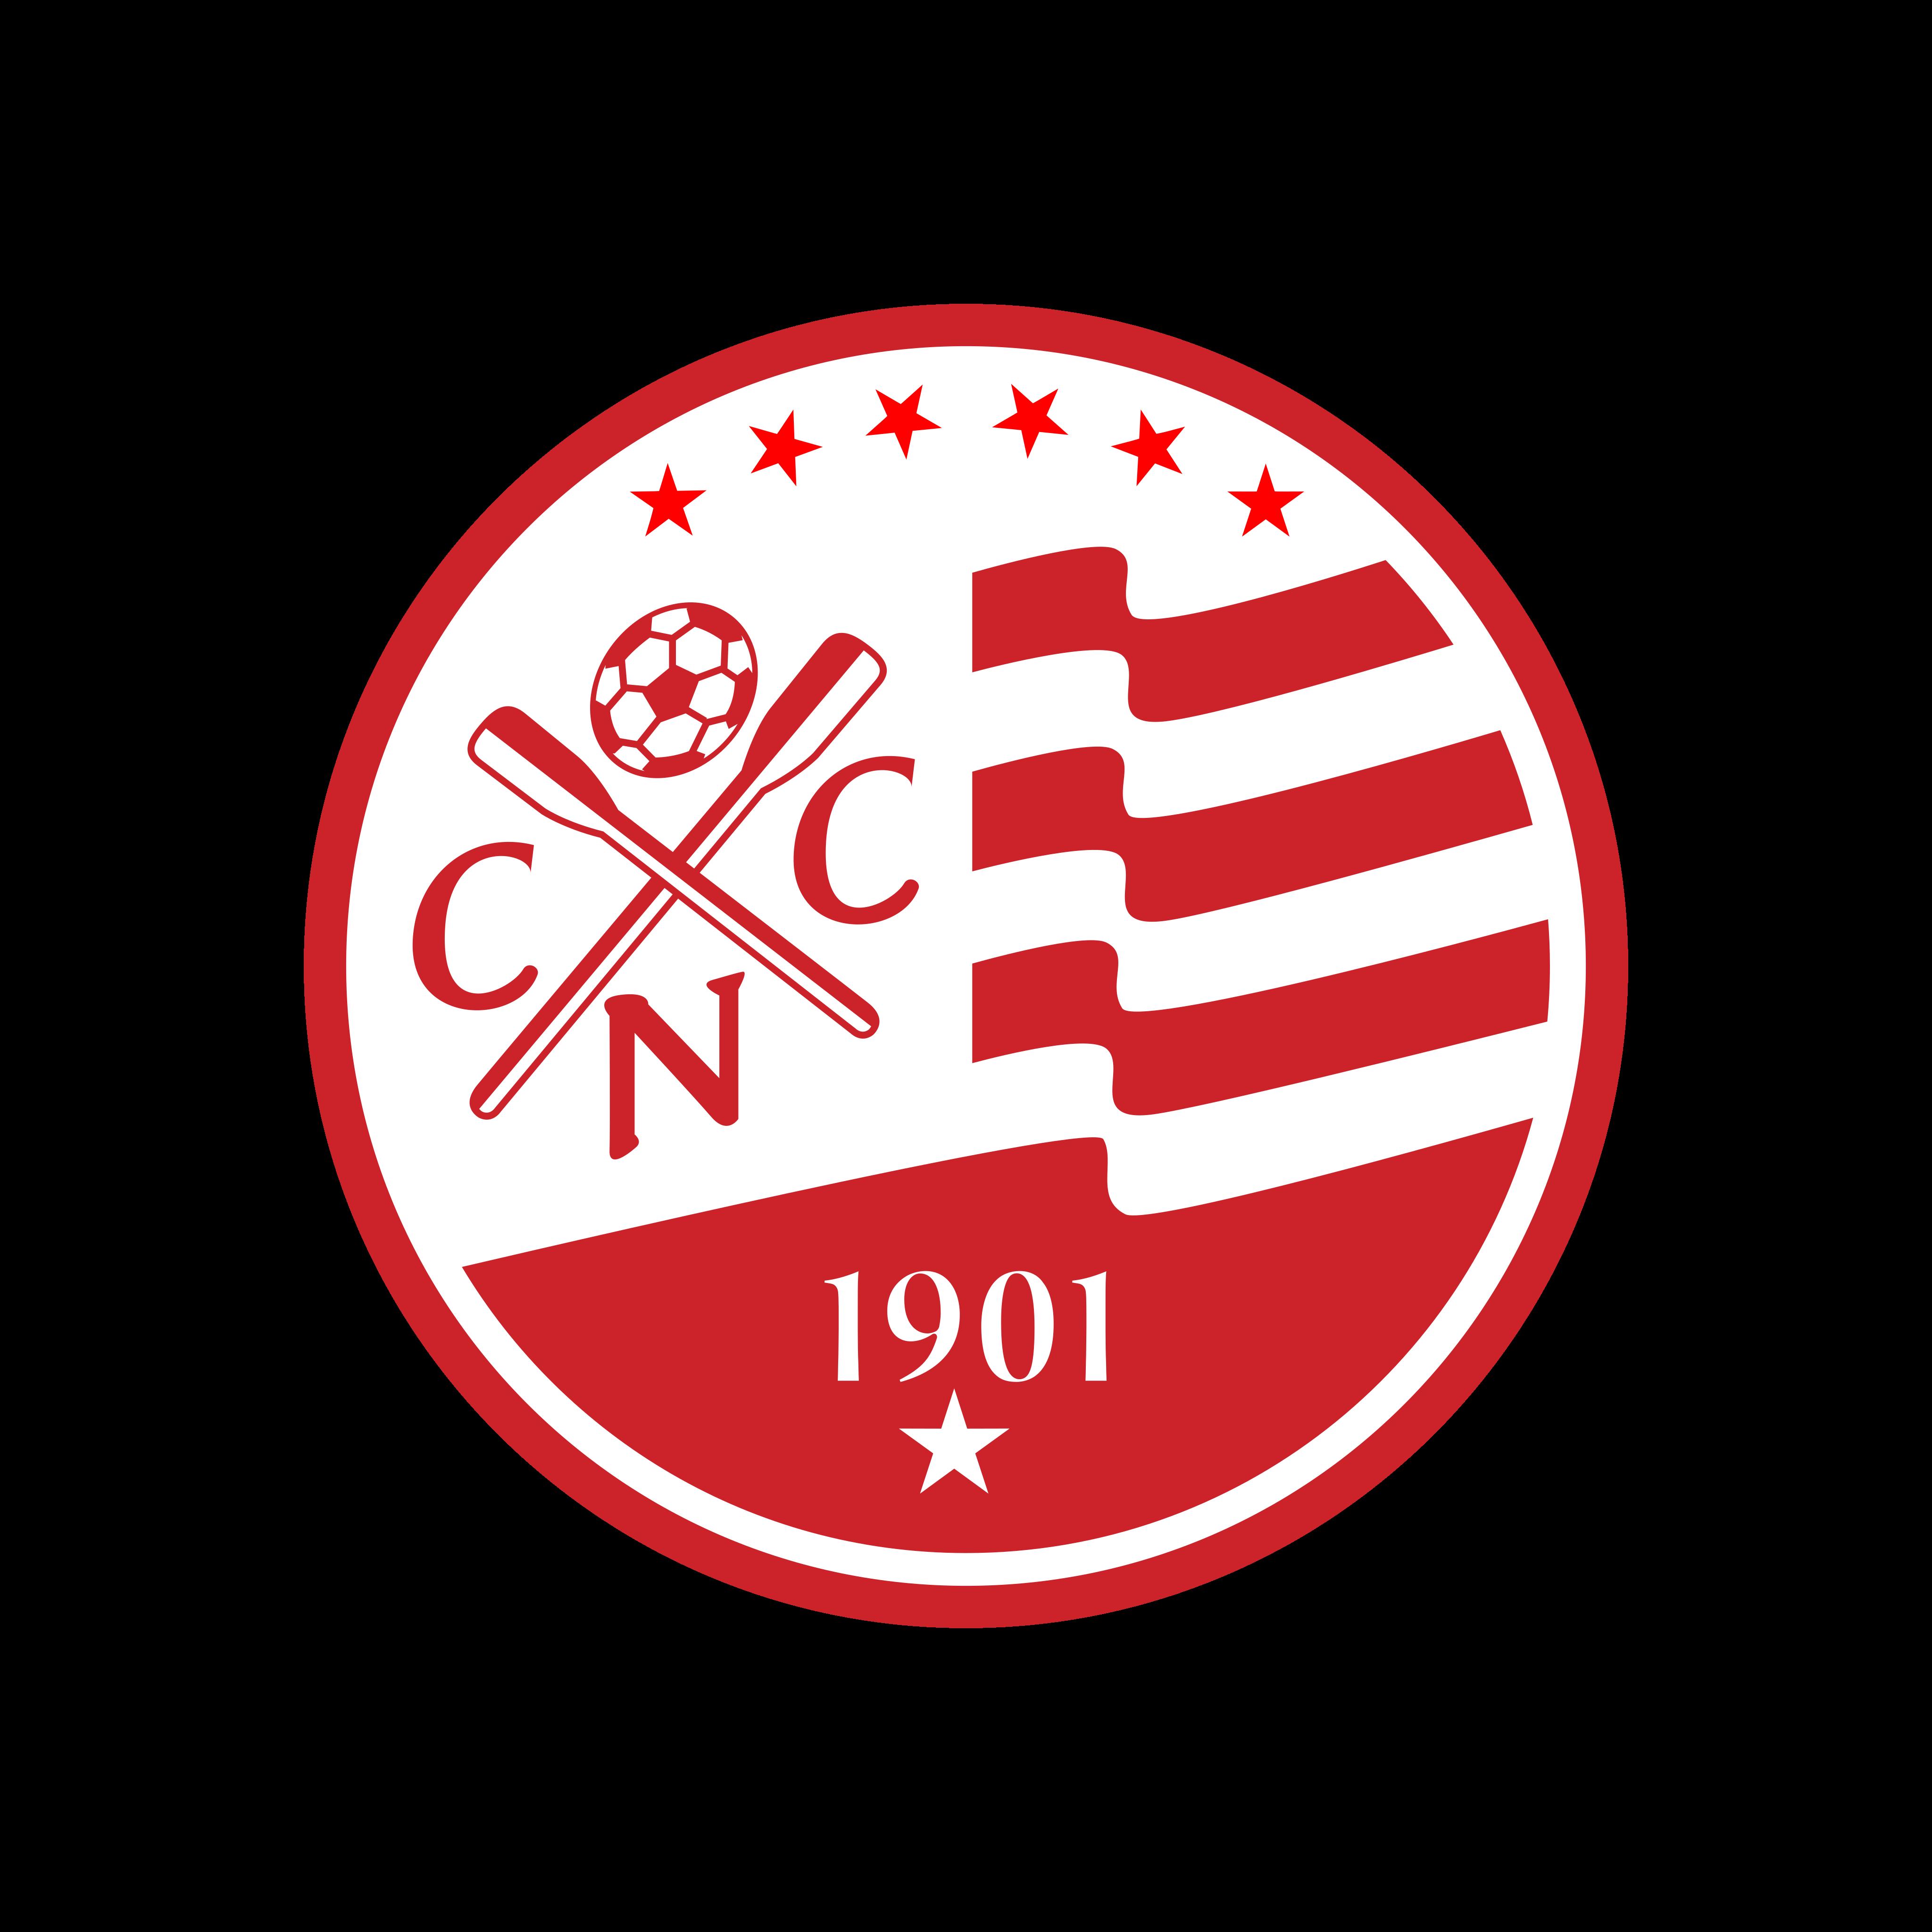 nautico logo 0 - Náutico Logo (Brazil)